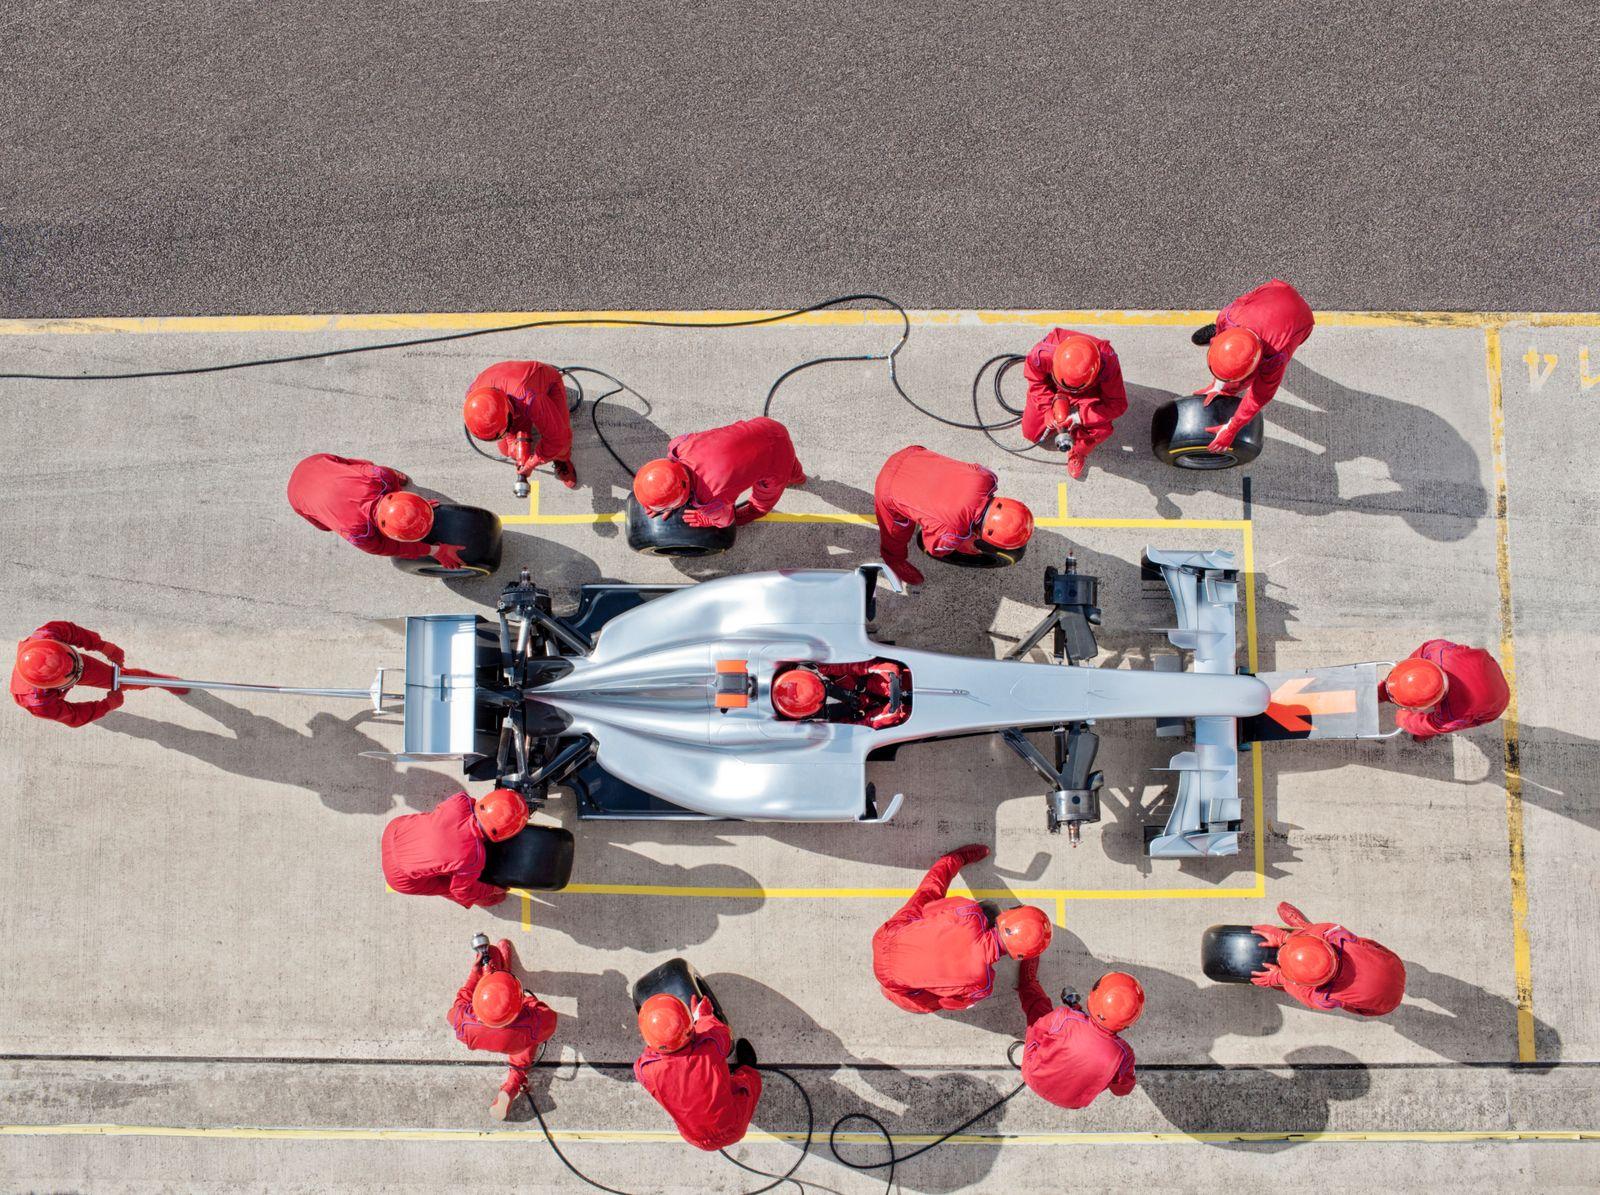 Rannauto / Formel1 / Boxenstopp